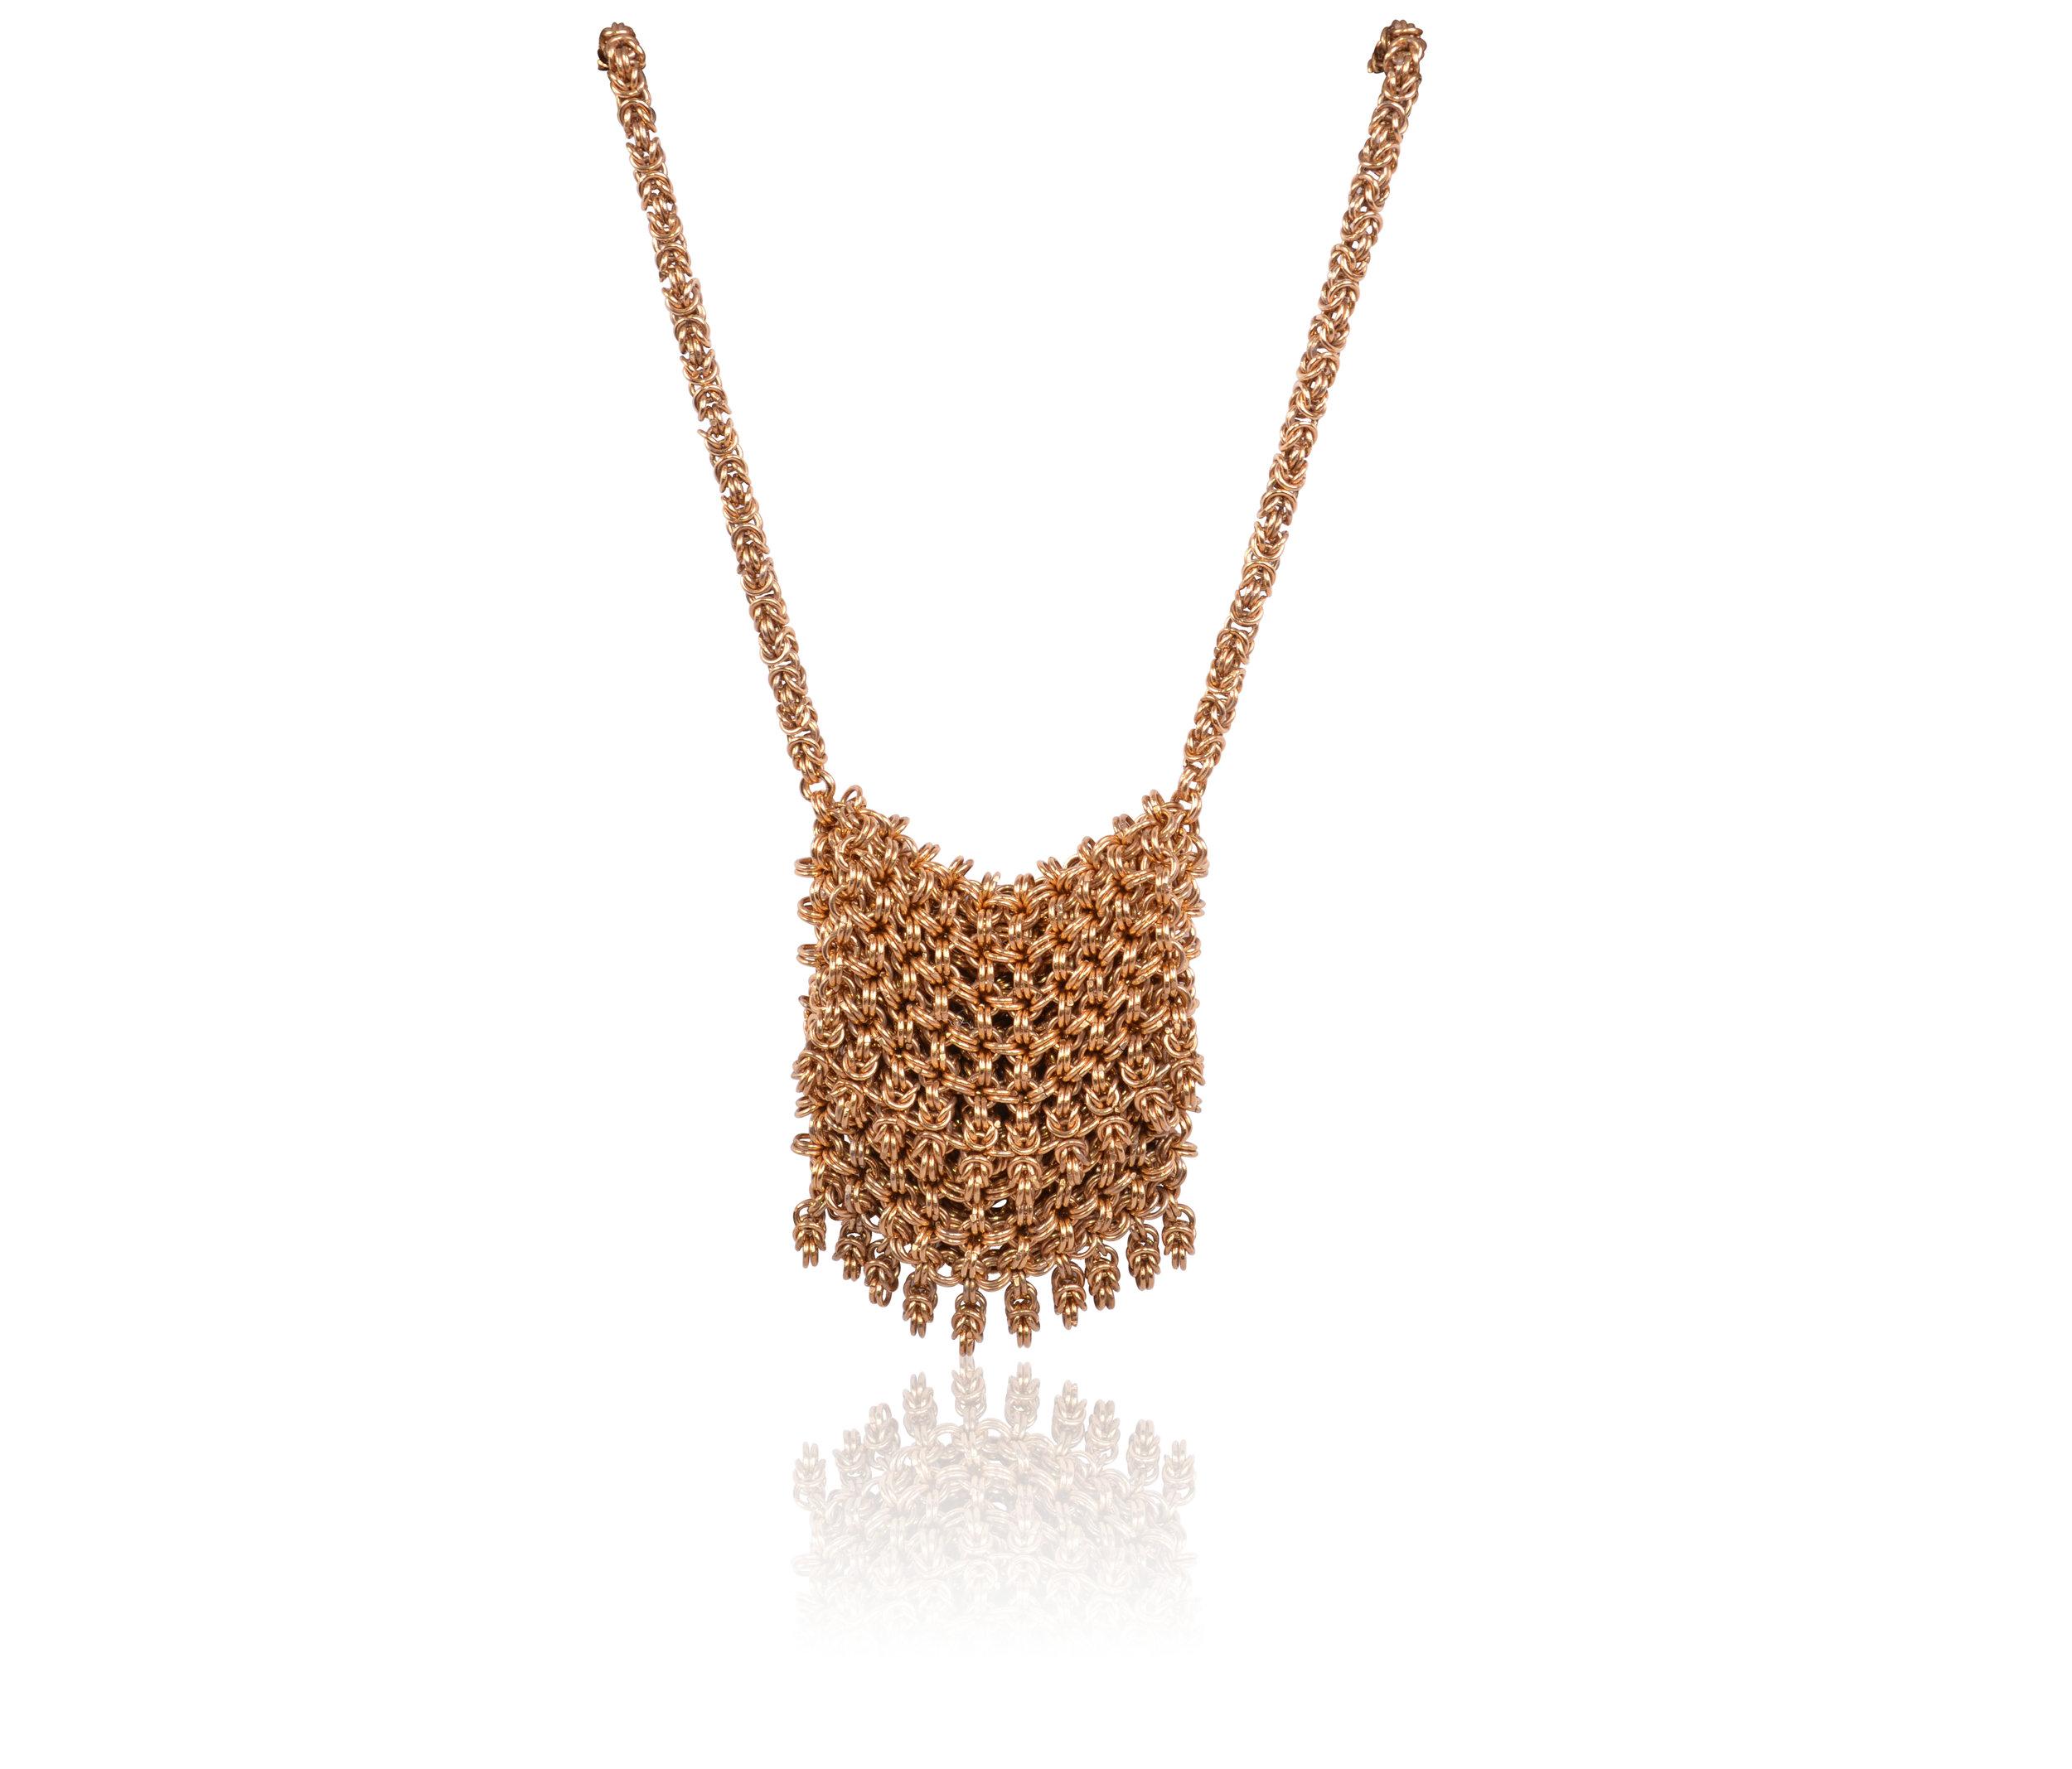 LIA051GD_1 - Lily Agresti - 'Gricel' Handmade Mesh Purse Necklace - Handmade Jewellery UK -.jpg